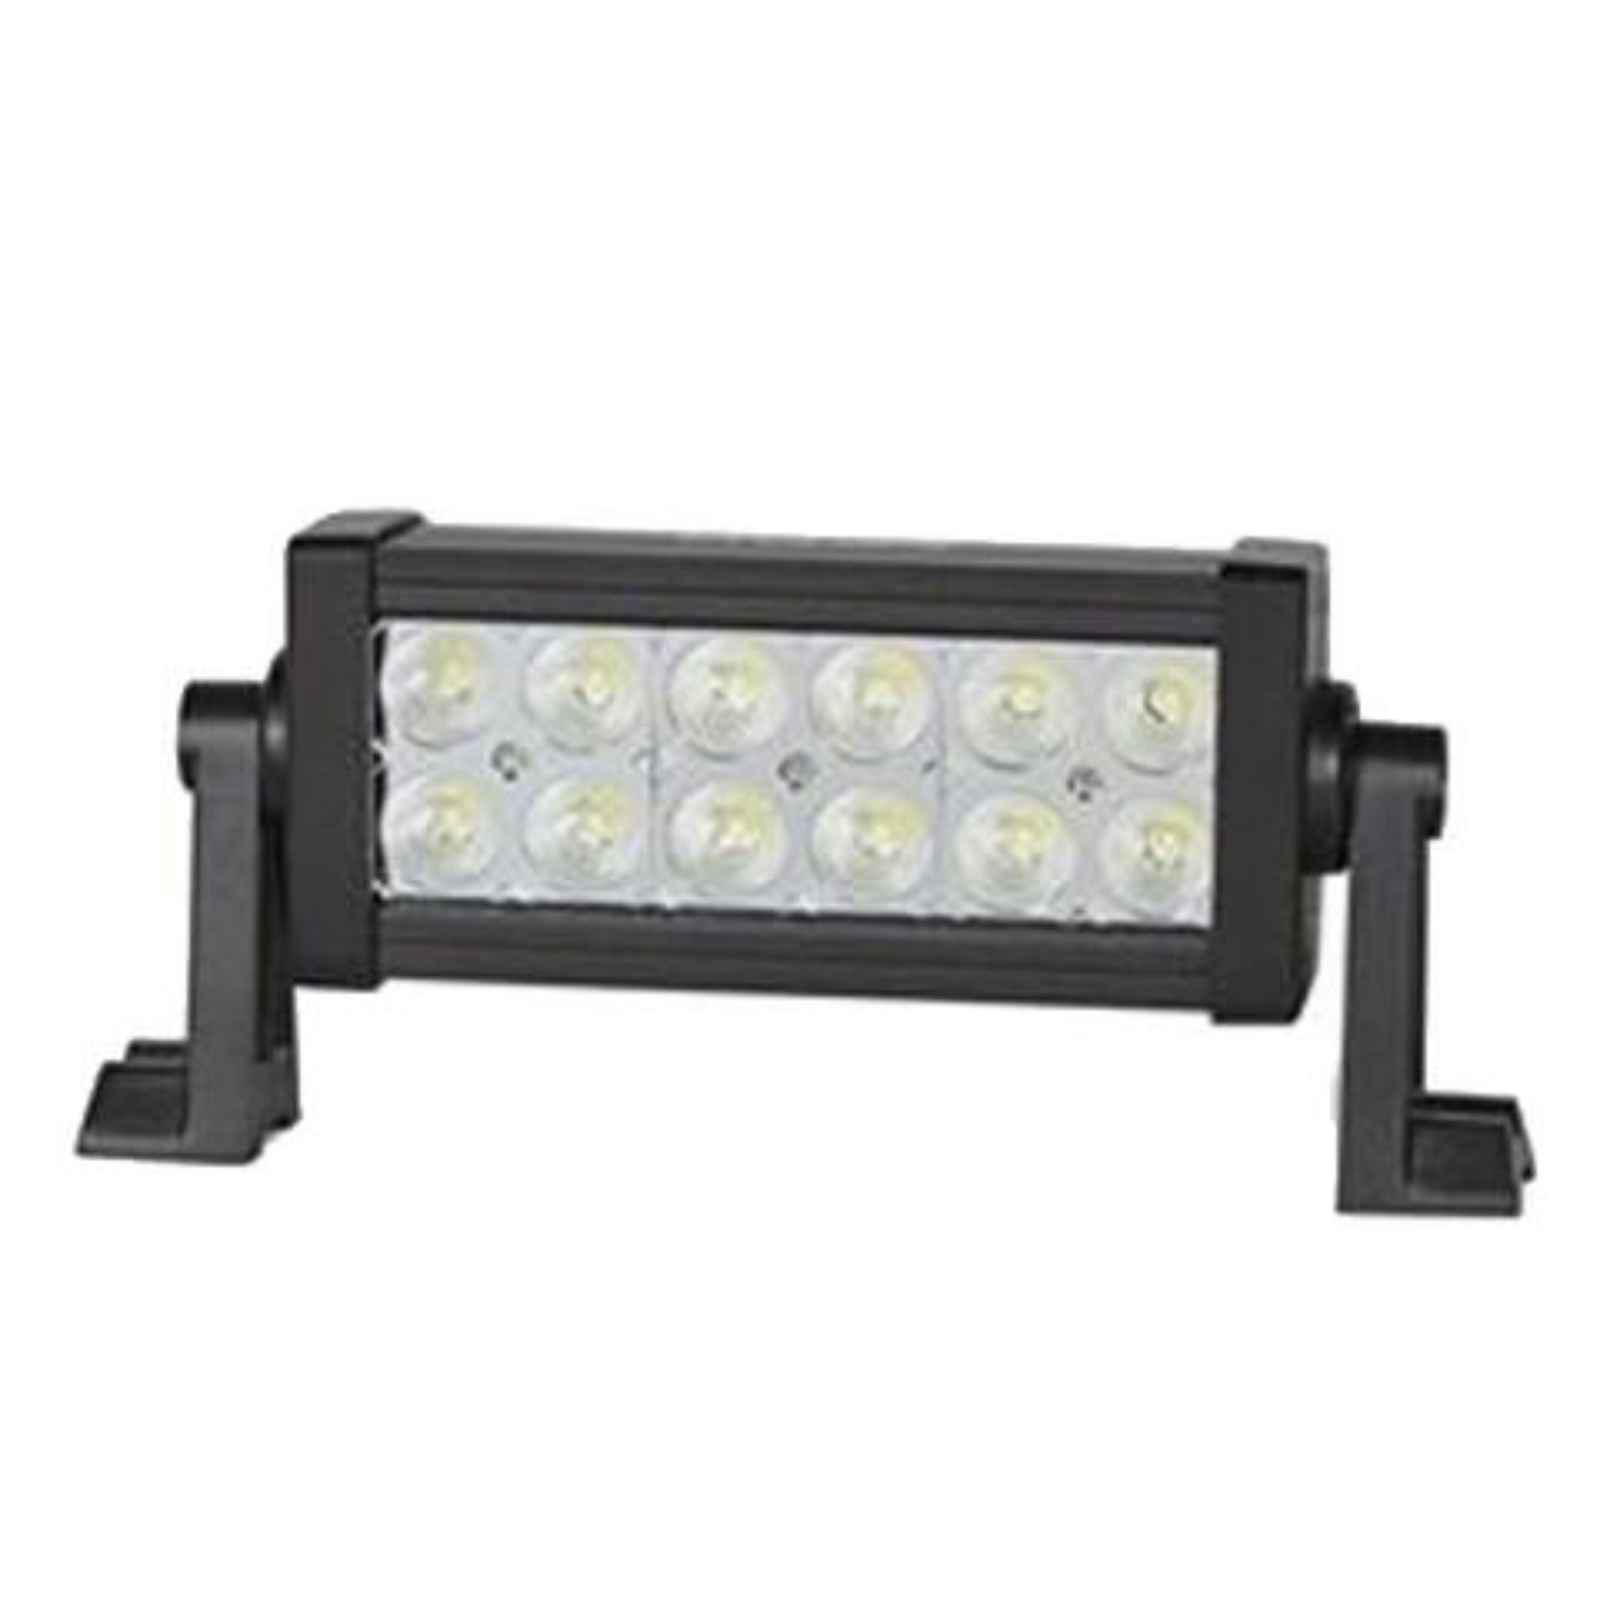 Cyclops Dual Row Light Bar LED 2,520 Lumens   CYC-LBDR36-SM